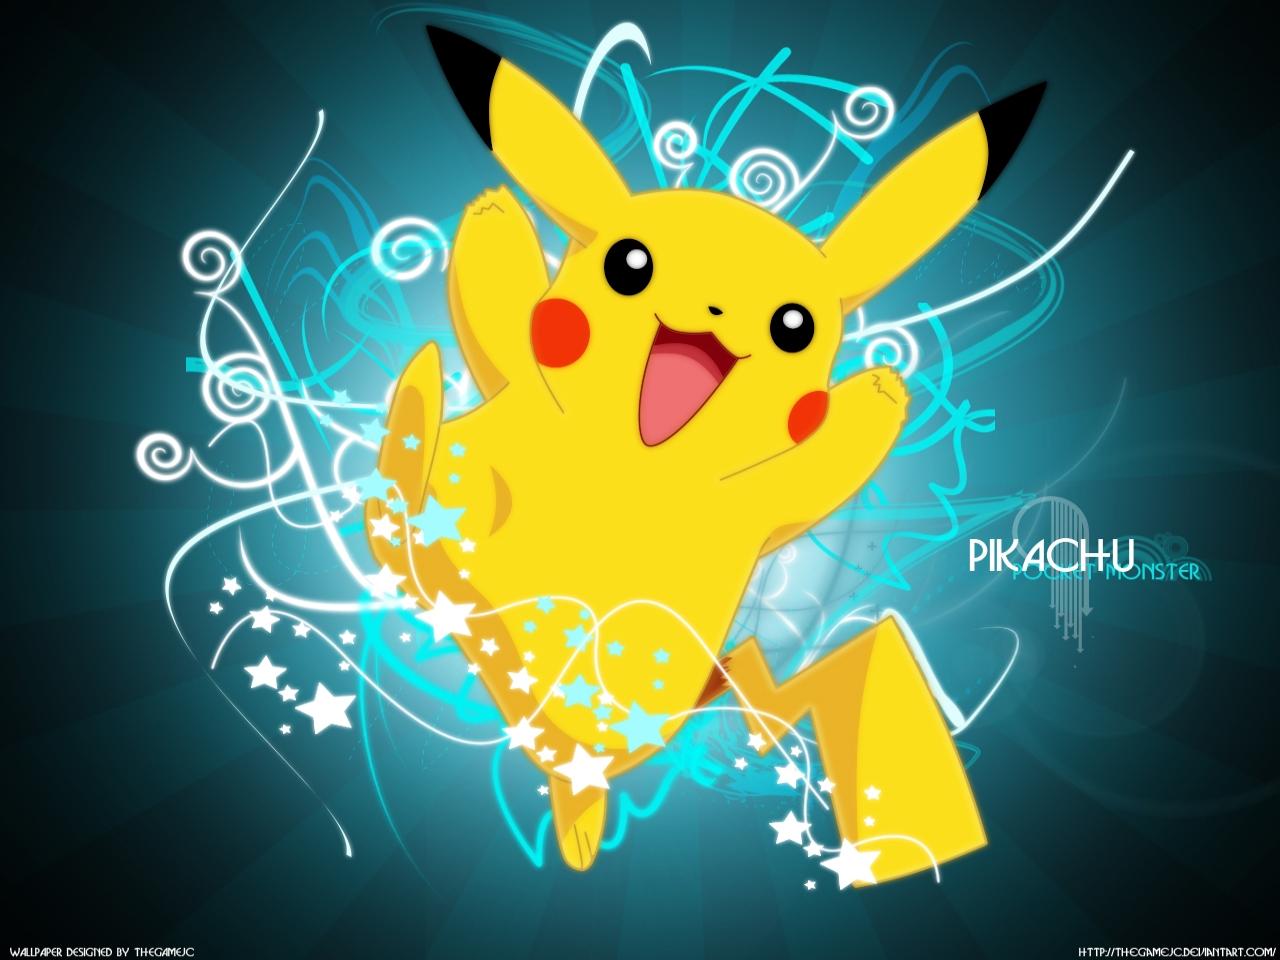 Pokémon pikachu